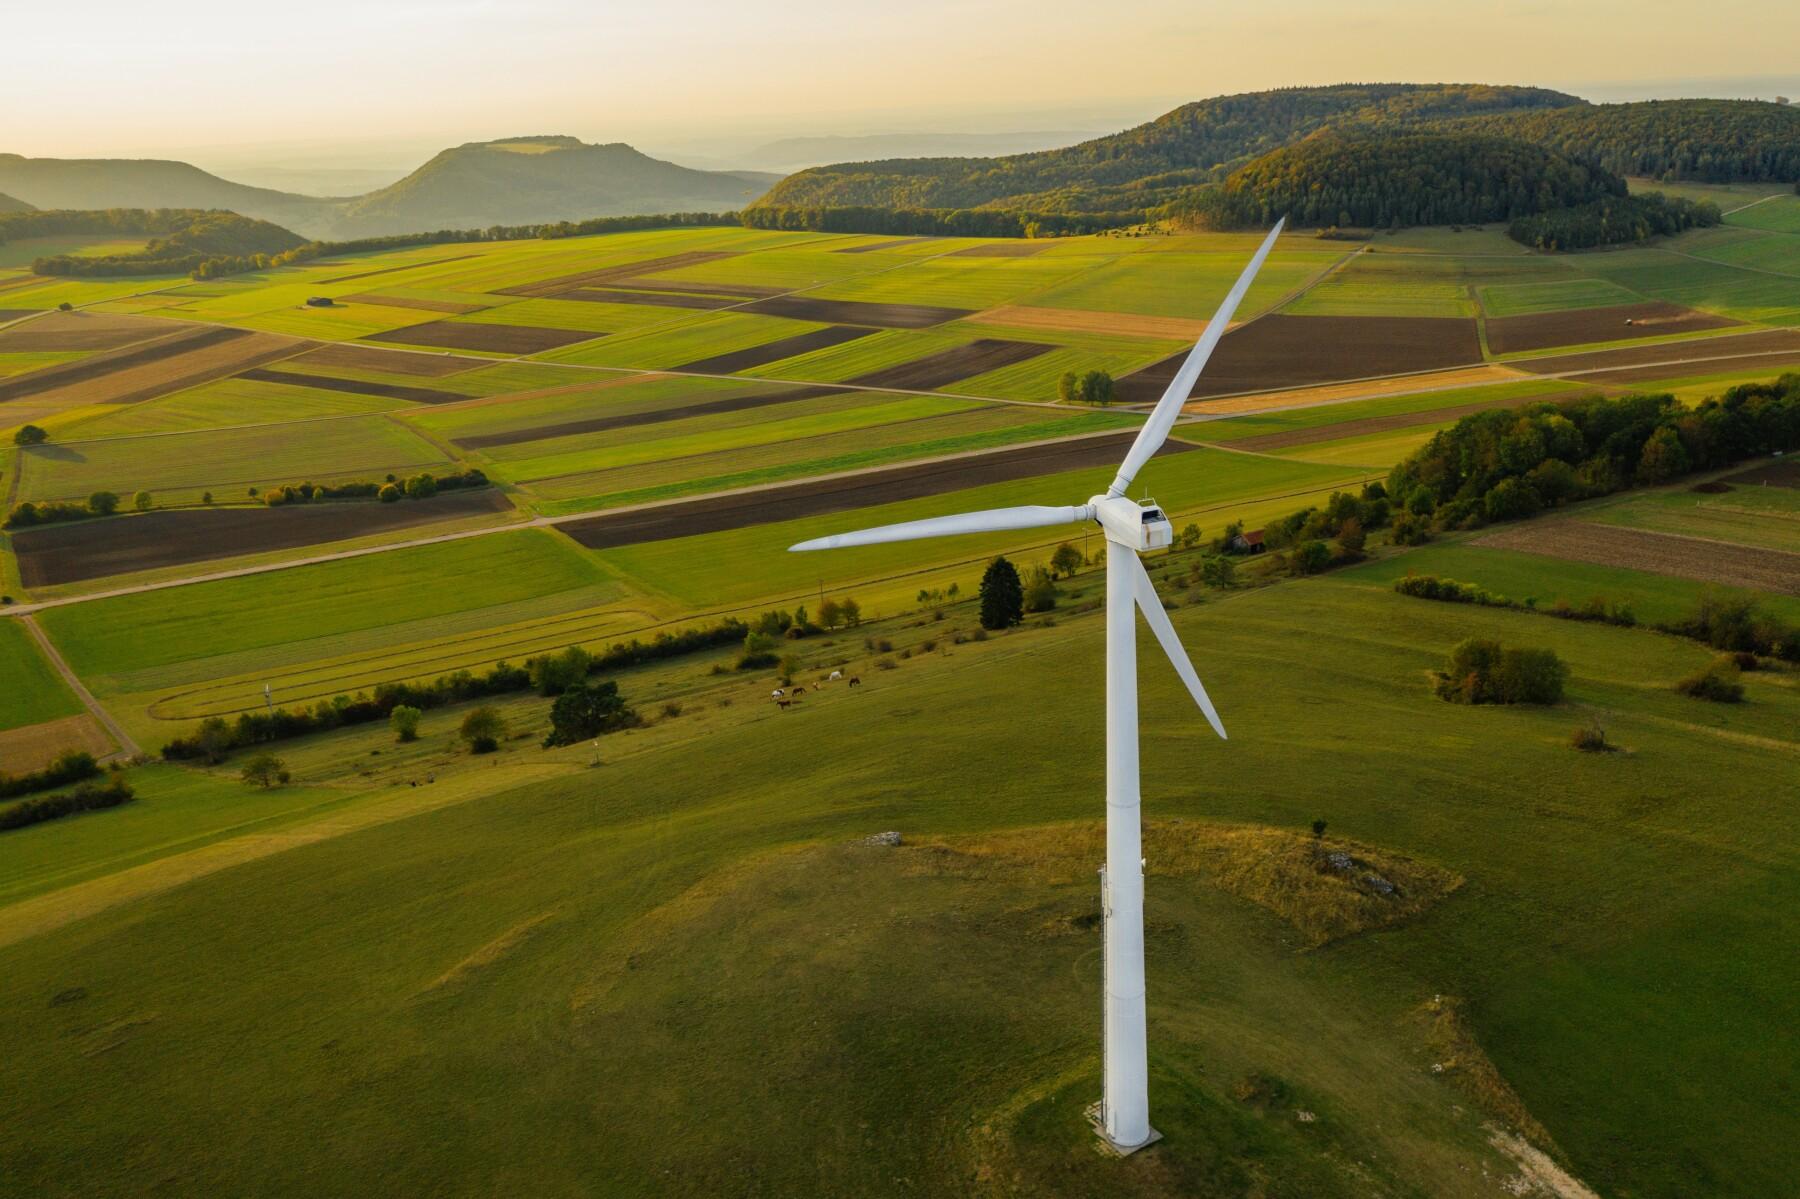 Alternative Energy Wind Turbine in Beautiful Green Landscape at Sunset